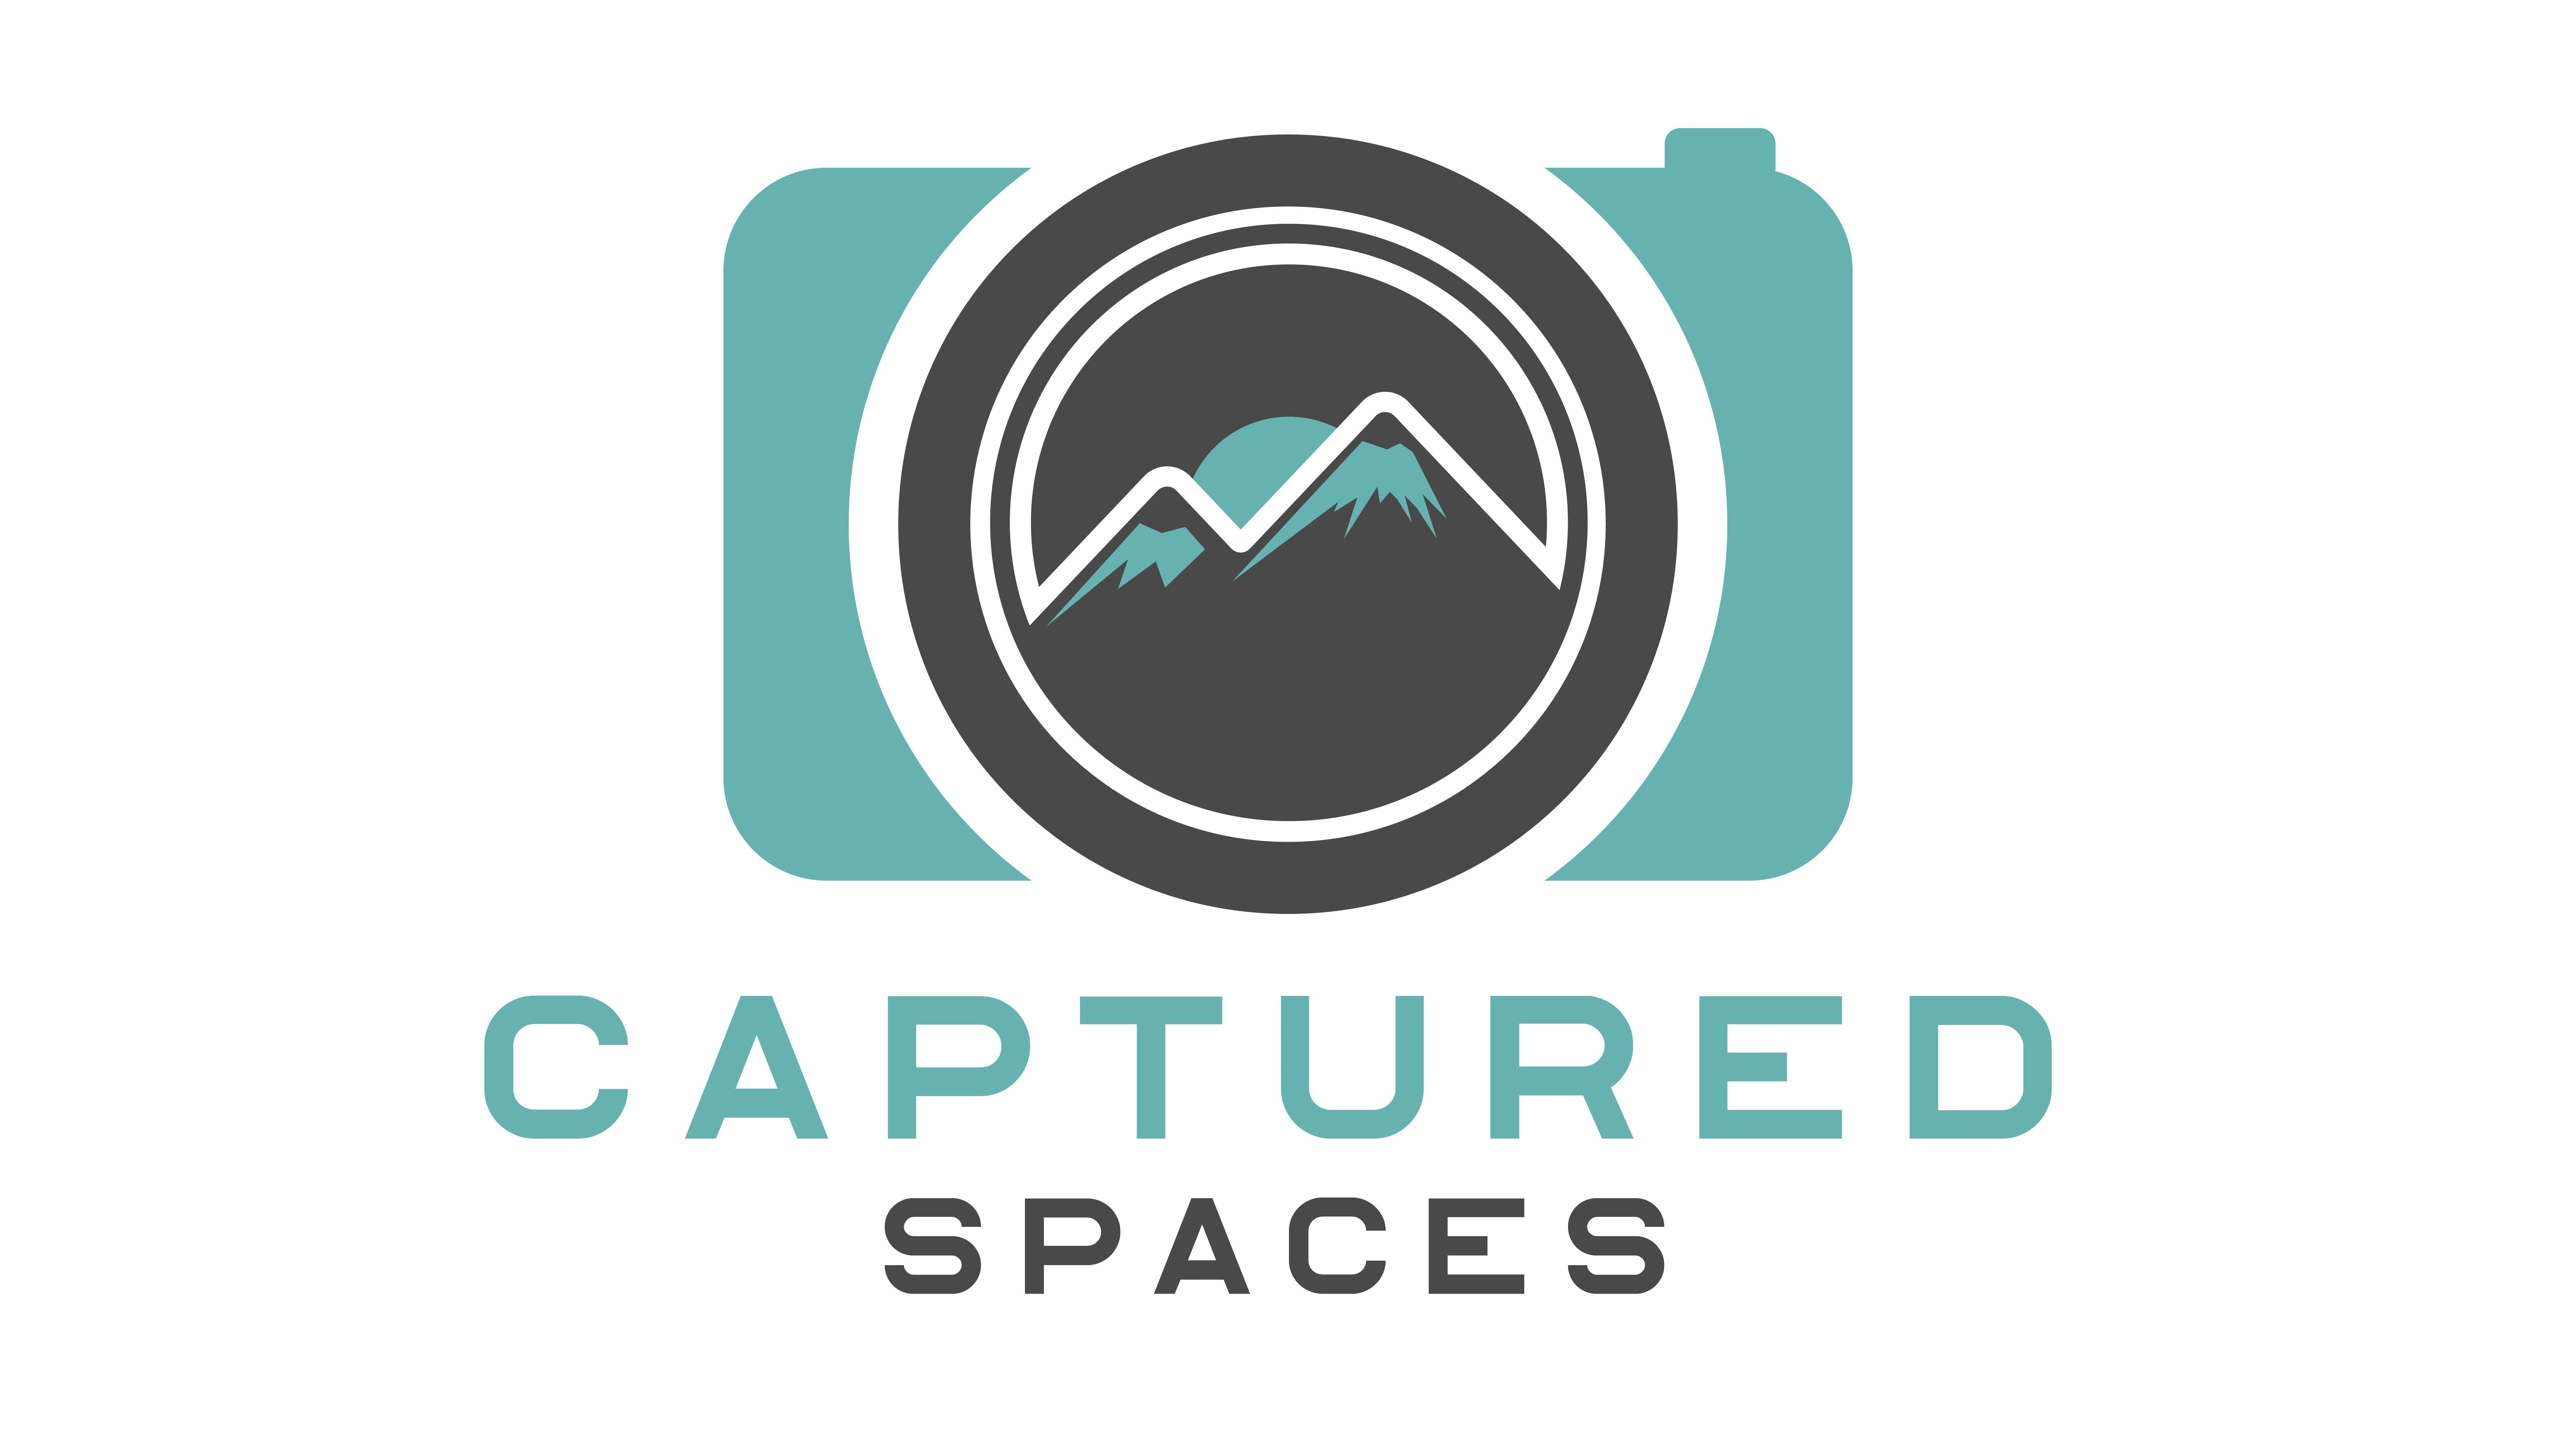 Captured Spaces LLC floor plan in Bountiful Brigham City Kaysville Layton Ogden Salt Lake City